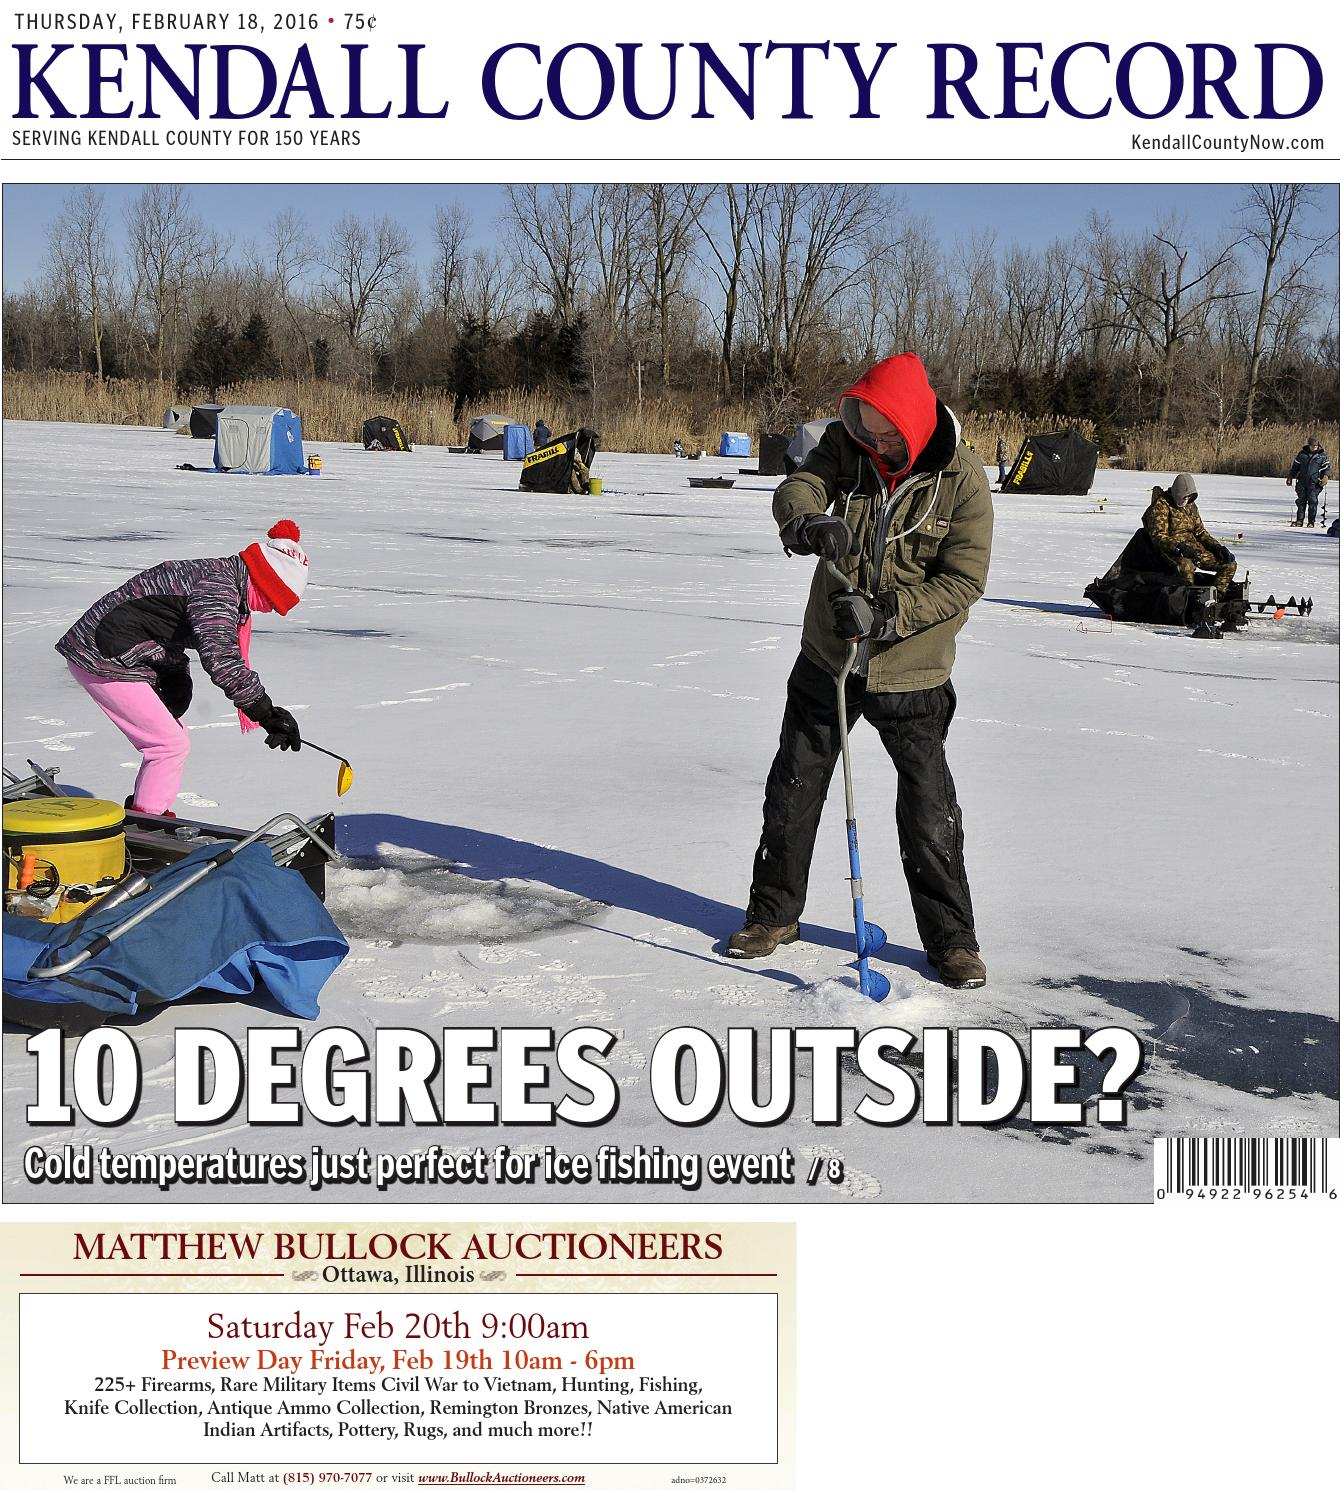 Illinois kendall county oswego - Illinois Kendall County Oswego 36